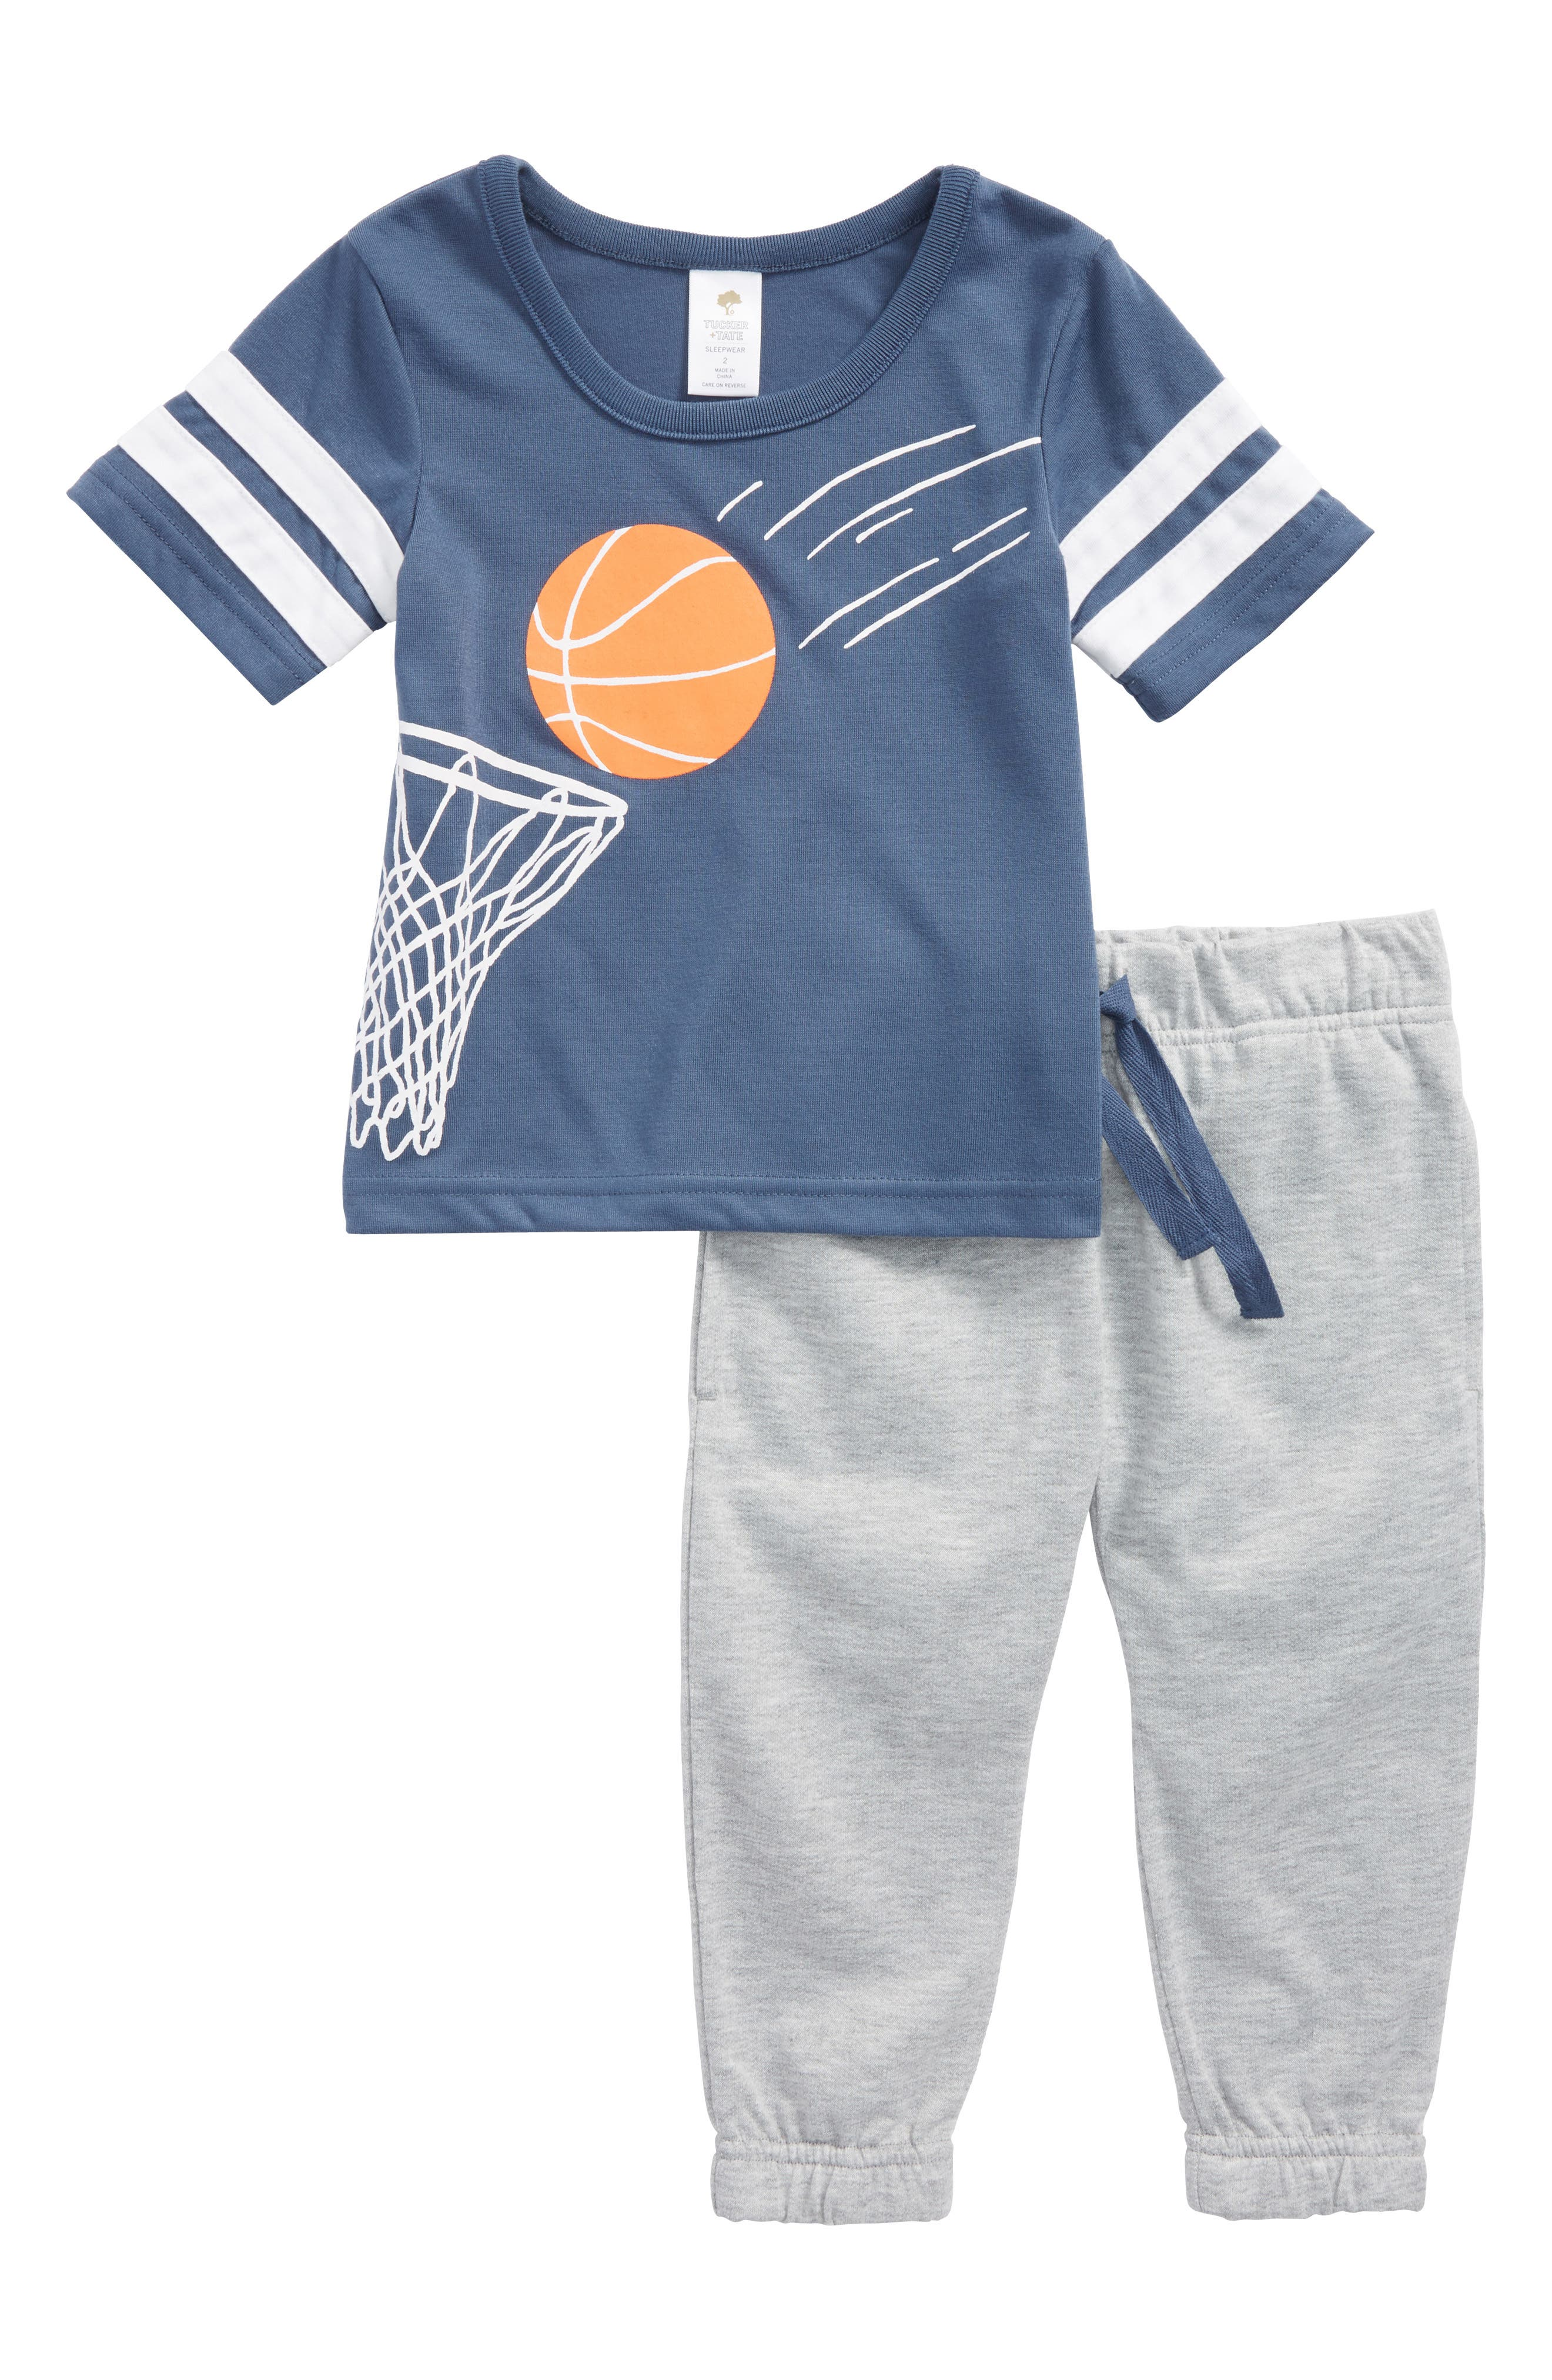 Yum Yum Two-Piece Pajamas,                             Main thumbnail 1, color,                             Blue Vintage Basket Swish